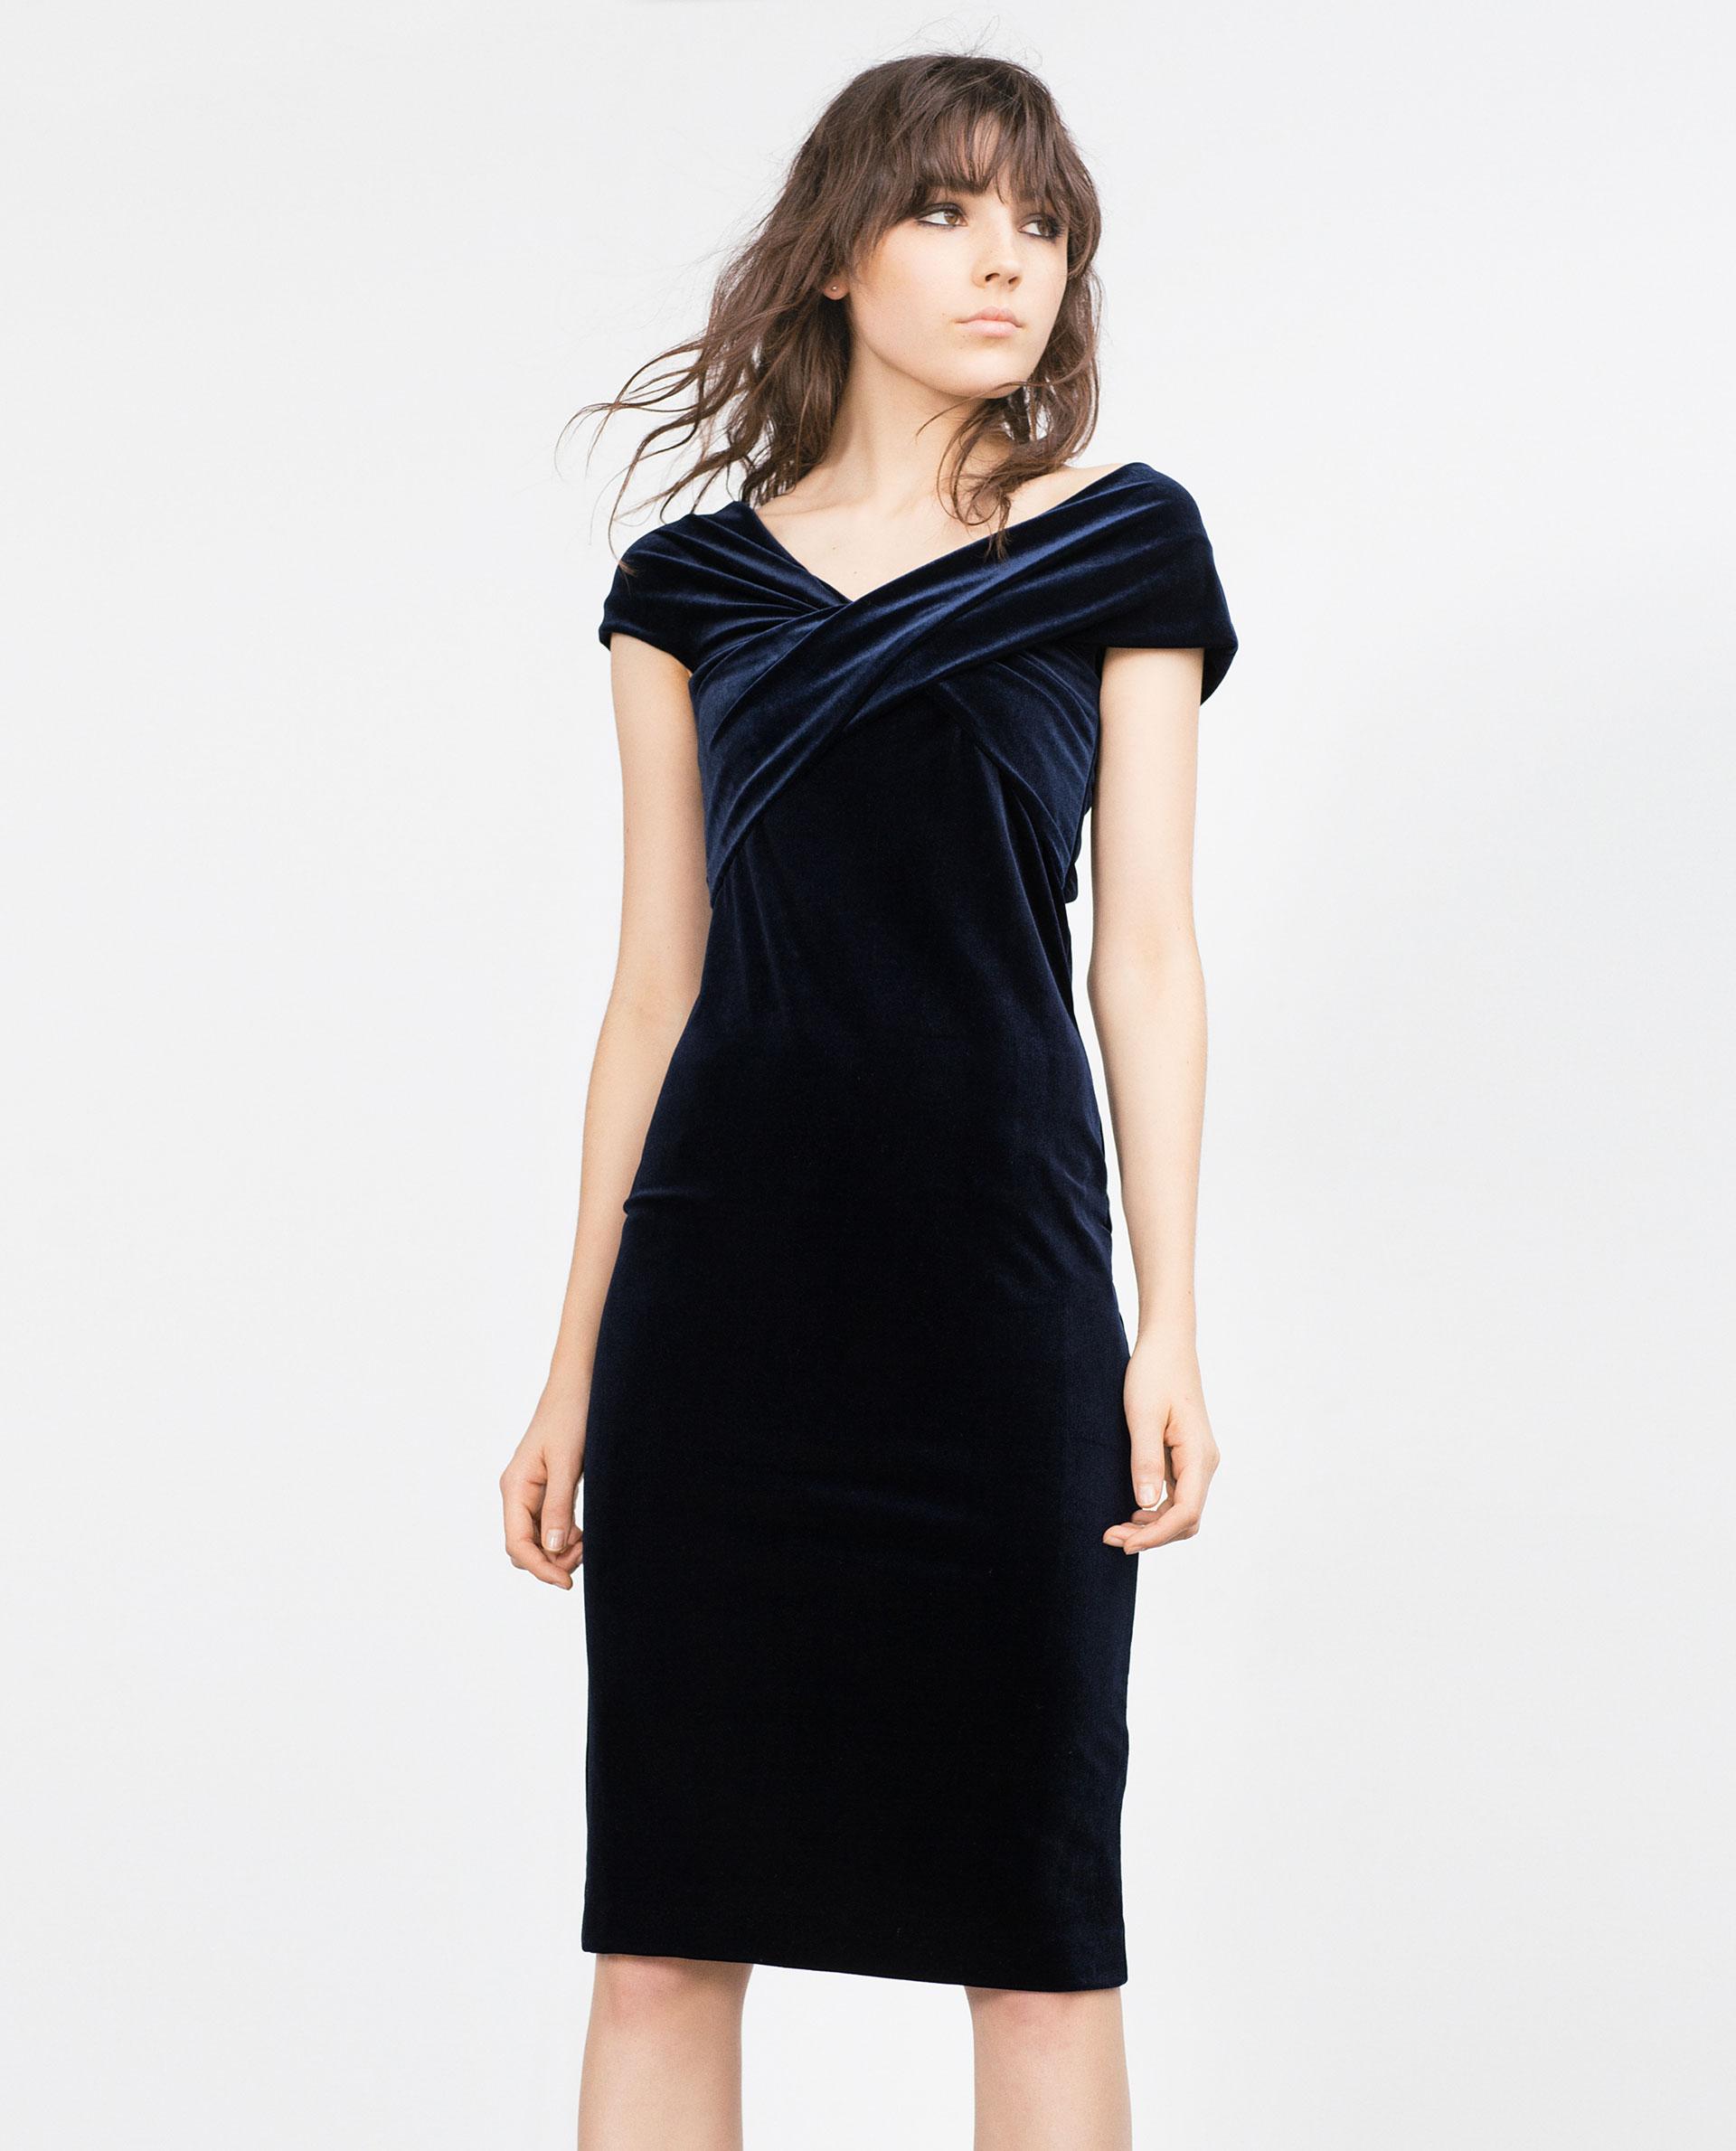 Vestido Zara terciopelo